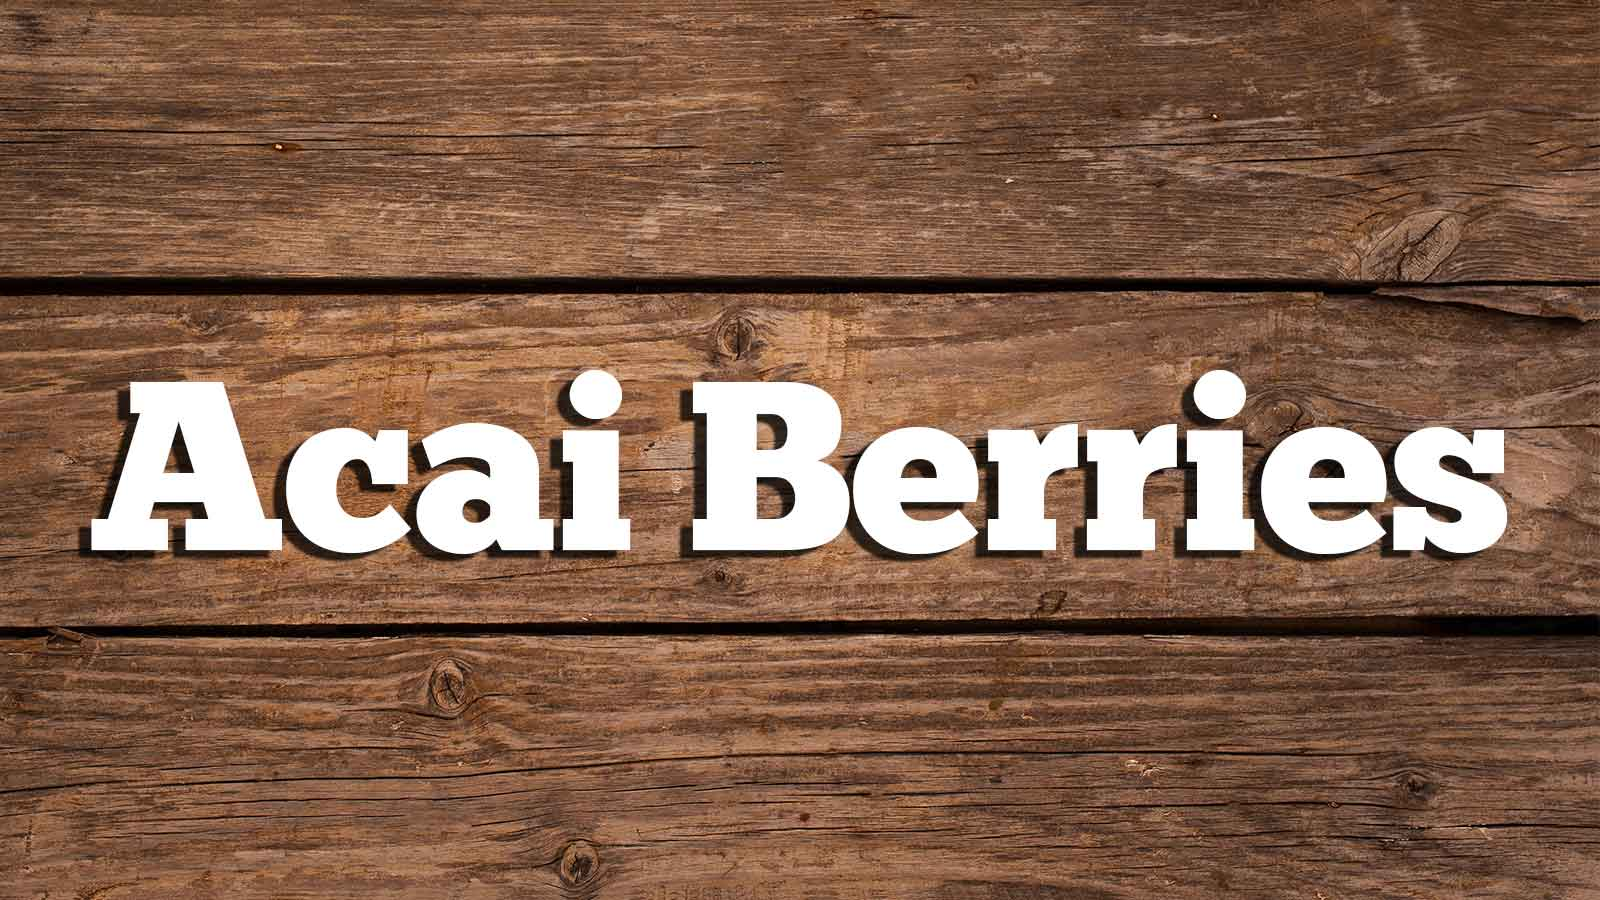 Image for Acai Berries